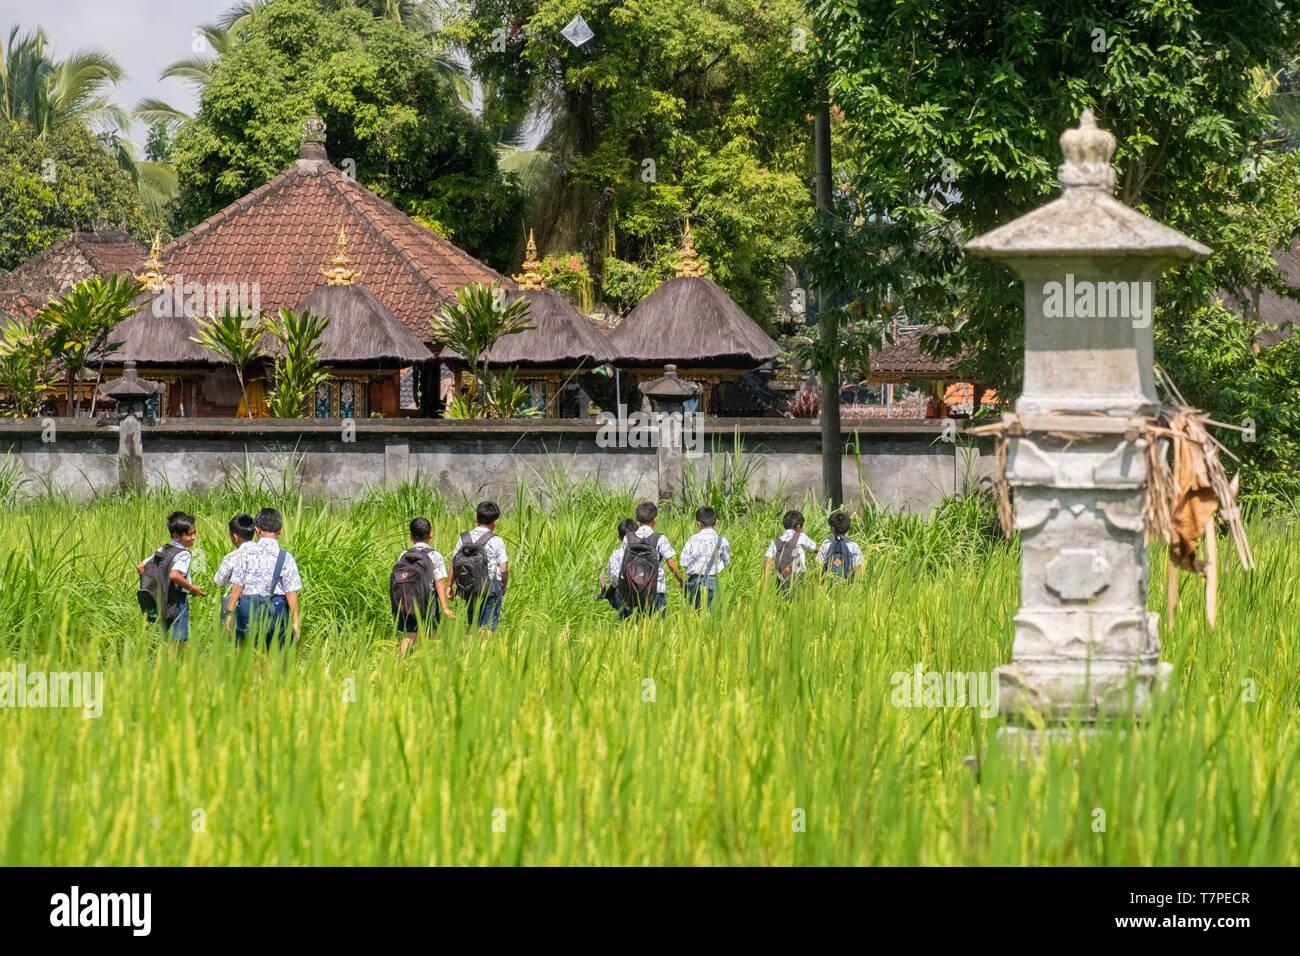 Indonesia, Bali, East Coast, schoolchildren after school among rice paddies - Stock Image